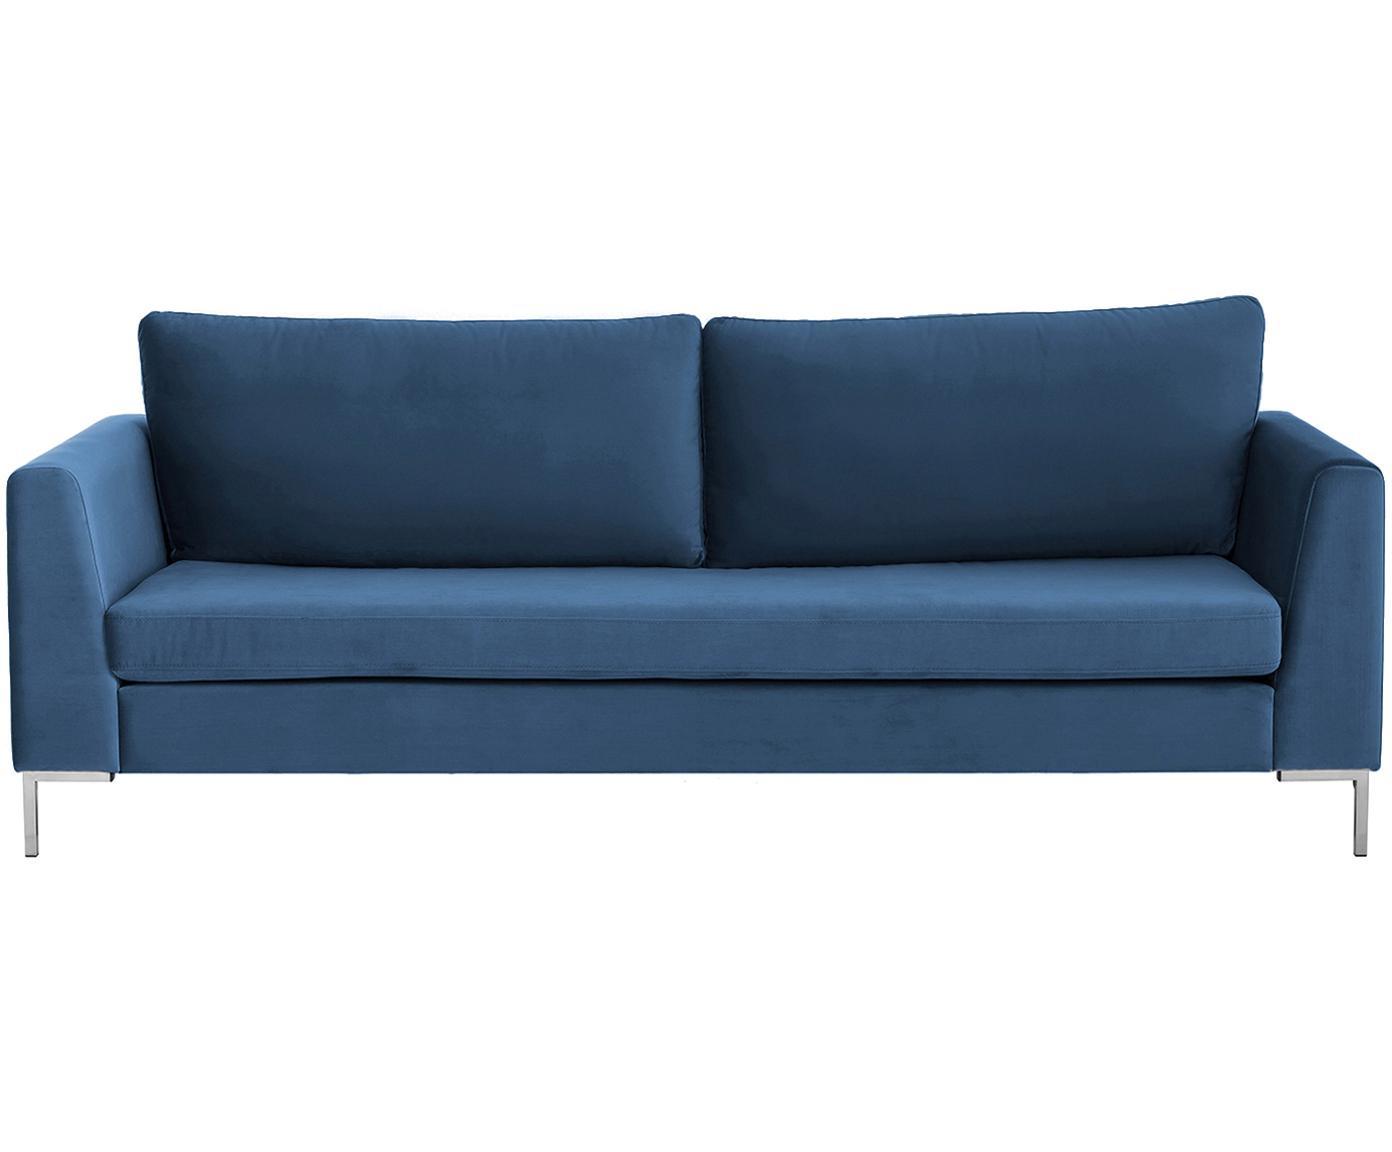 Samt-Sofa Luna (3-Sitzer), Bezug: Samt (Polyester) 80.000 S, Gestell: Massives Buchenholz, Füße: Metall, galvanisiert, Samt Blau, Silber, B 230 x T 95 cm